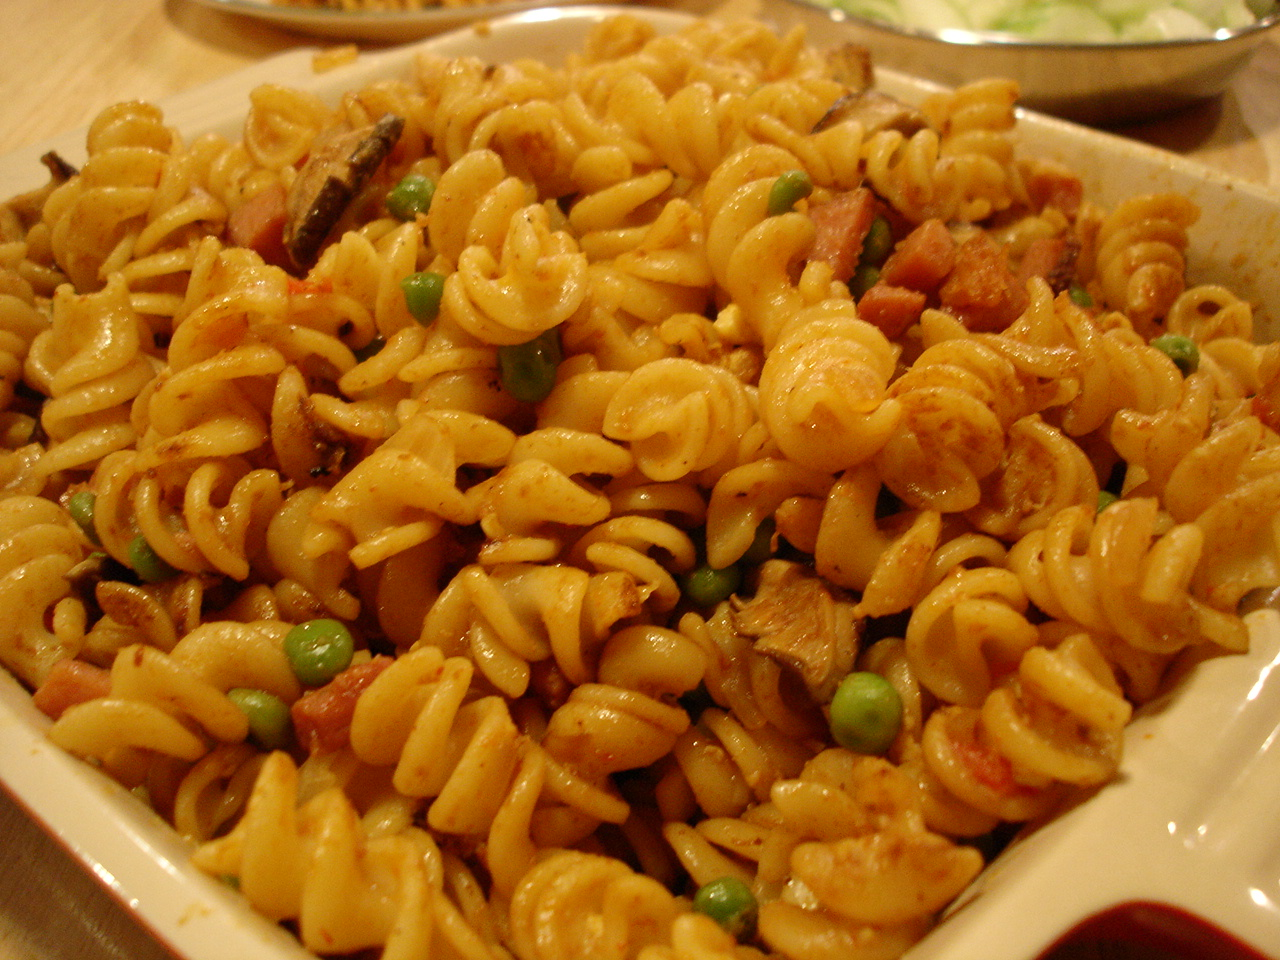 Cuisine italienne for Artistic argentinean cuisine